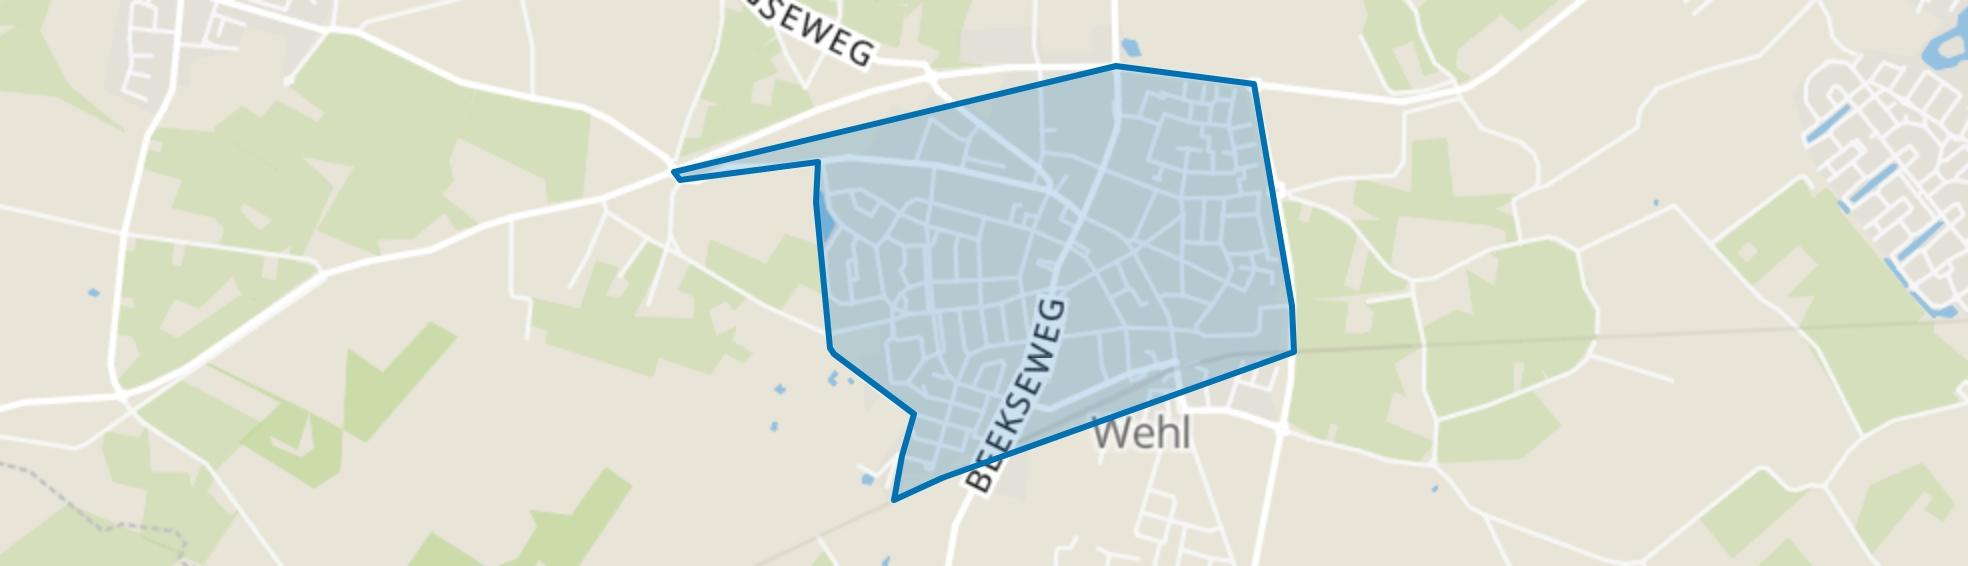 Wehl-Centrum, Wehl map